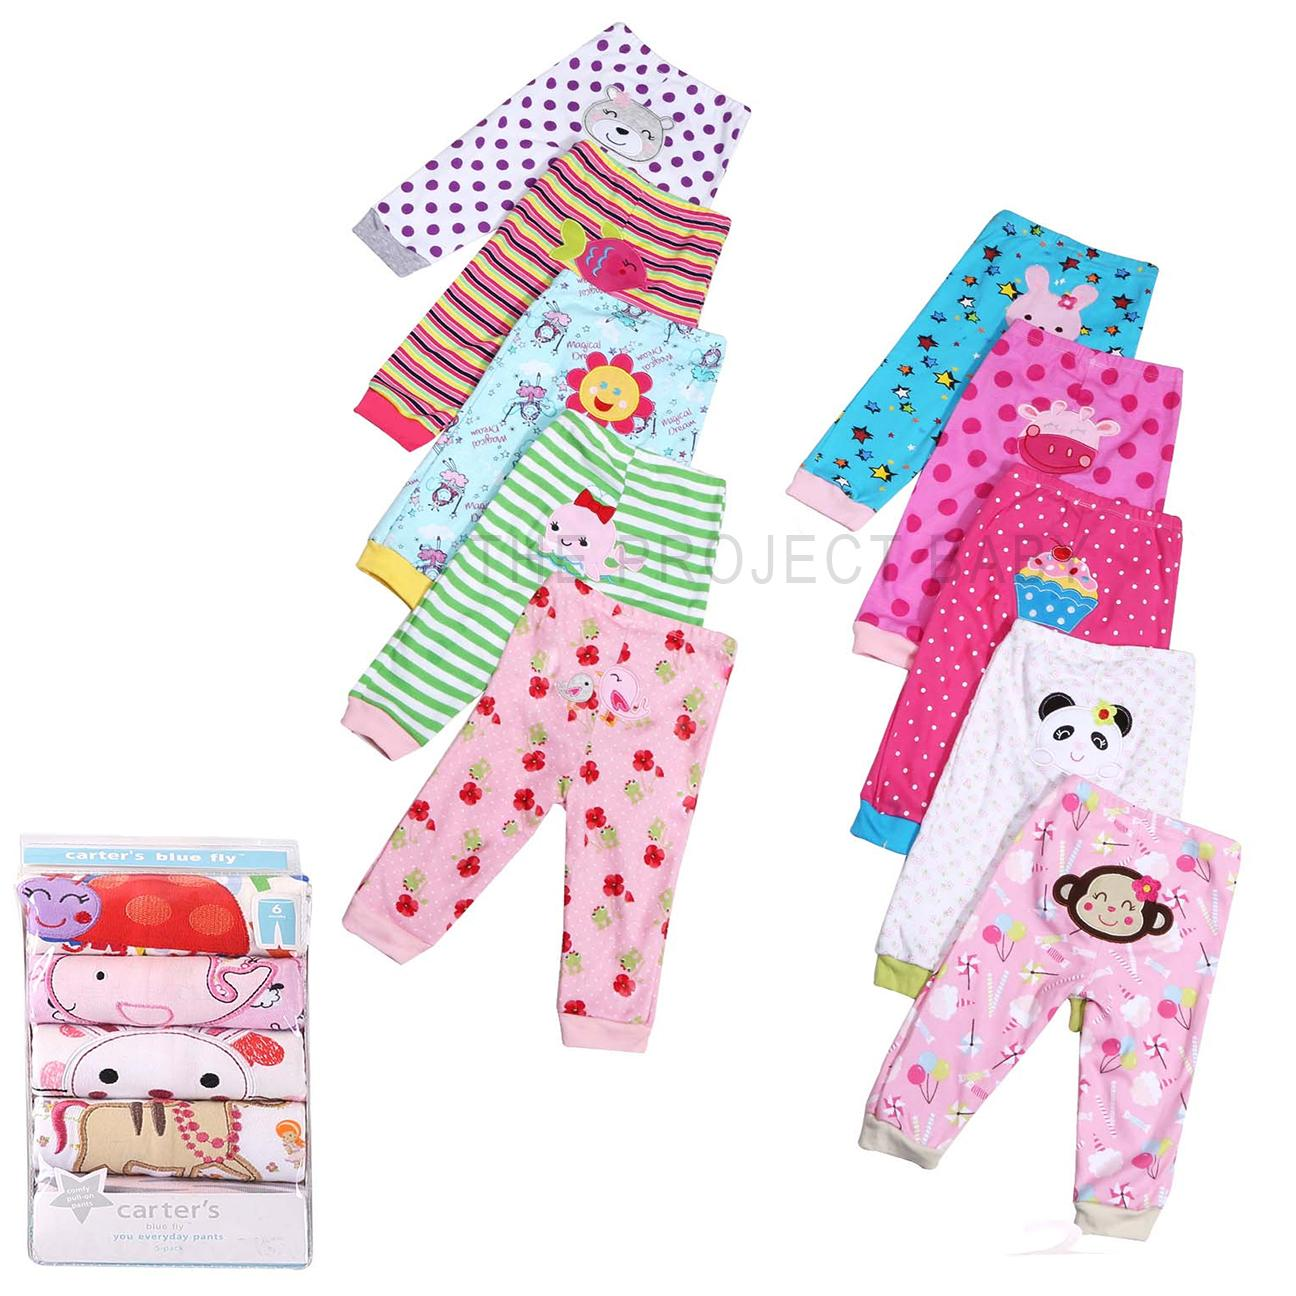 56bc19496 5 pack Carter's bluefly 100% Cotton Baby Girl pants sleepwear bottom  pajamas kids infant set